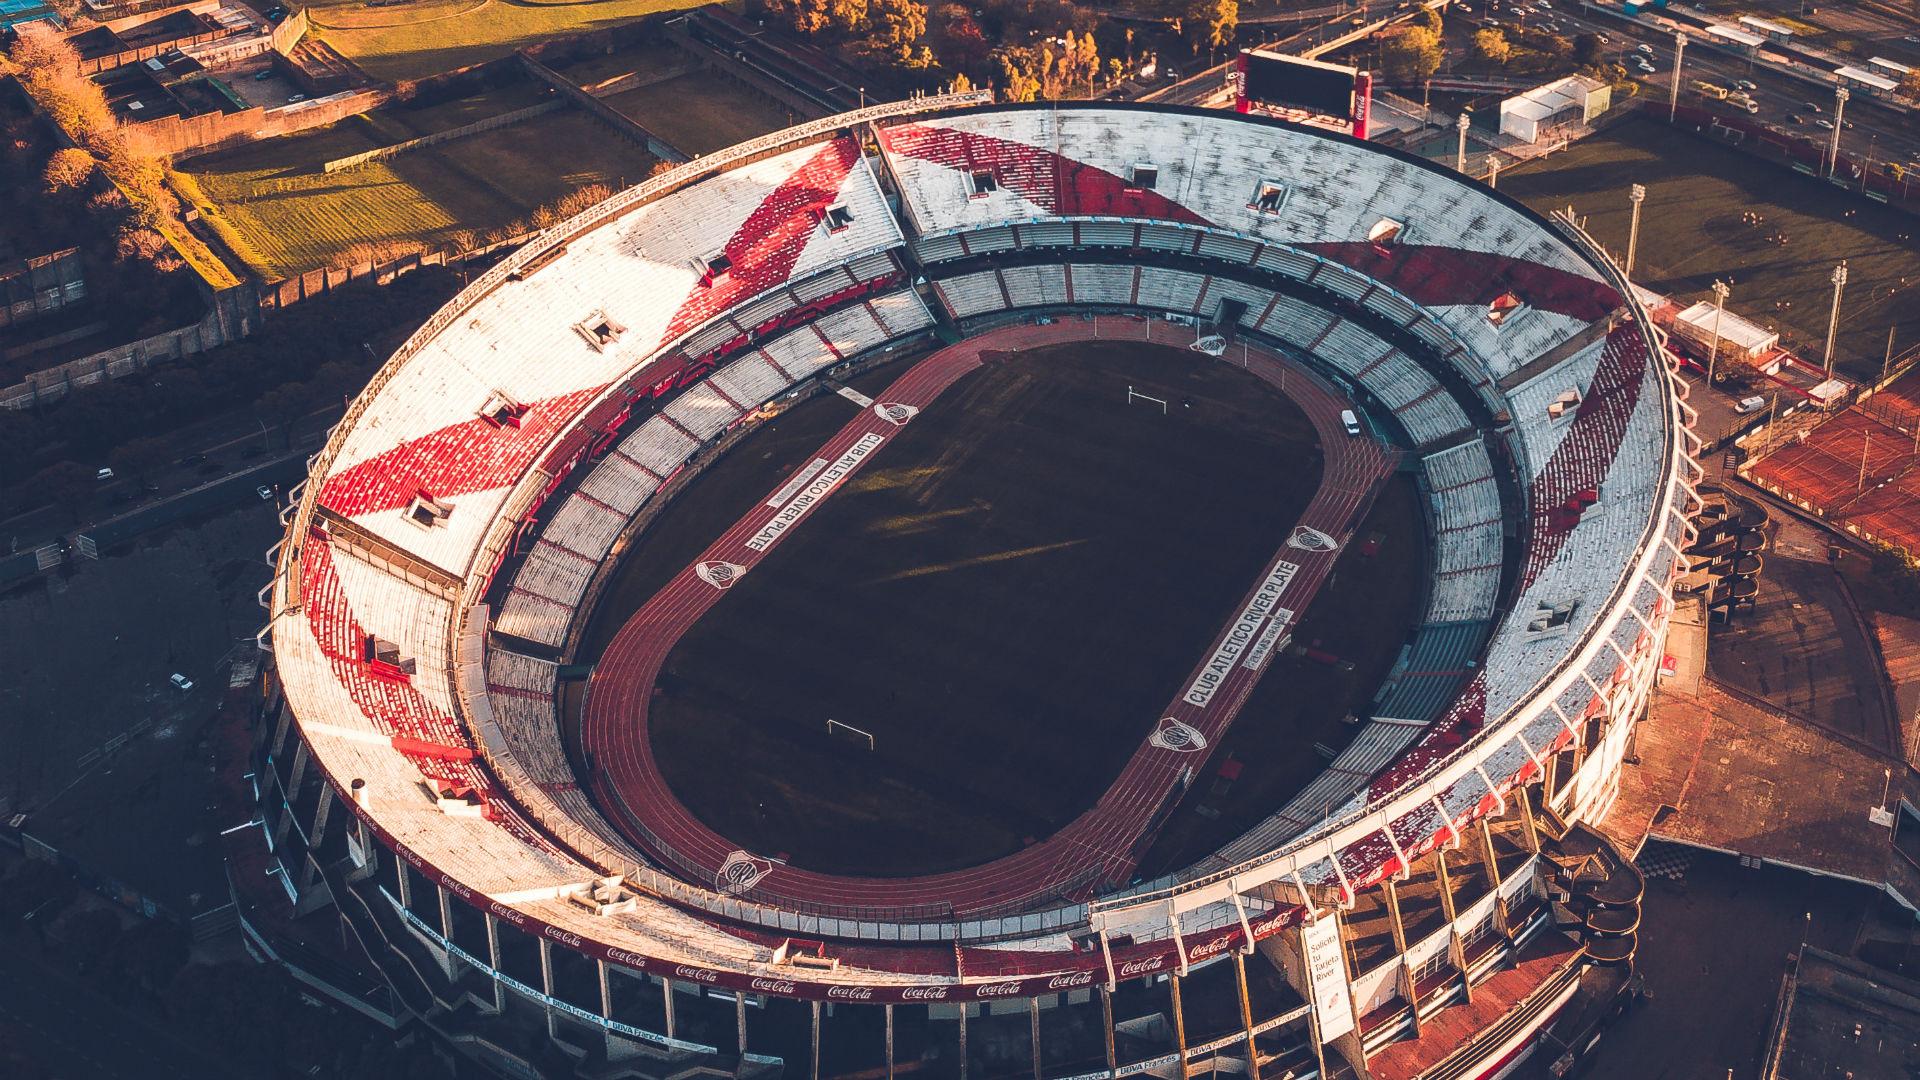 Estadio Monumental Copa Libertadores 2018